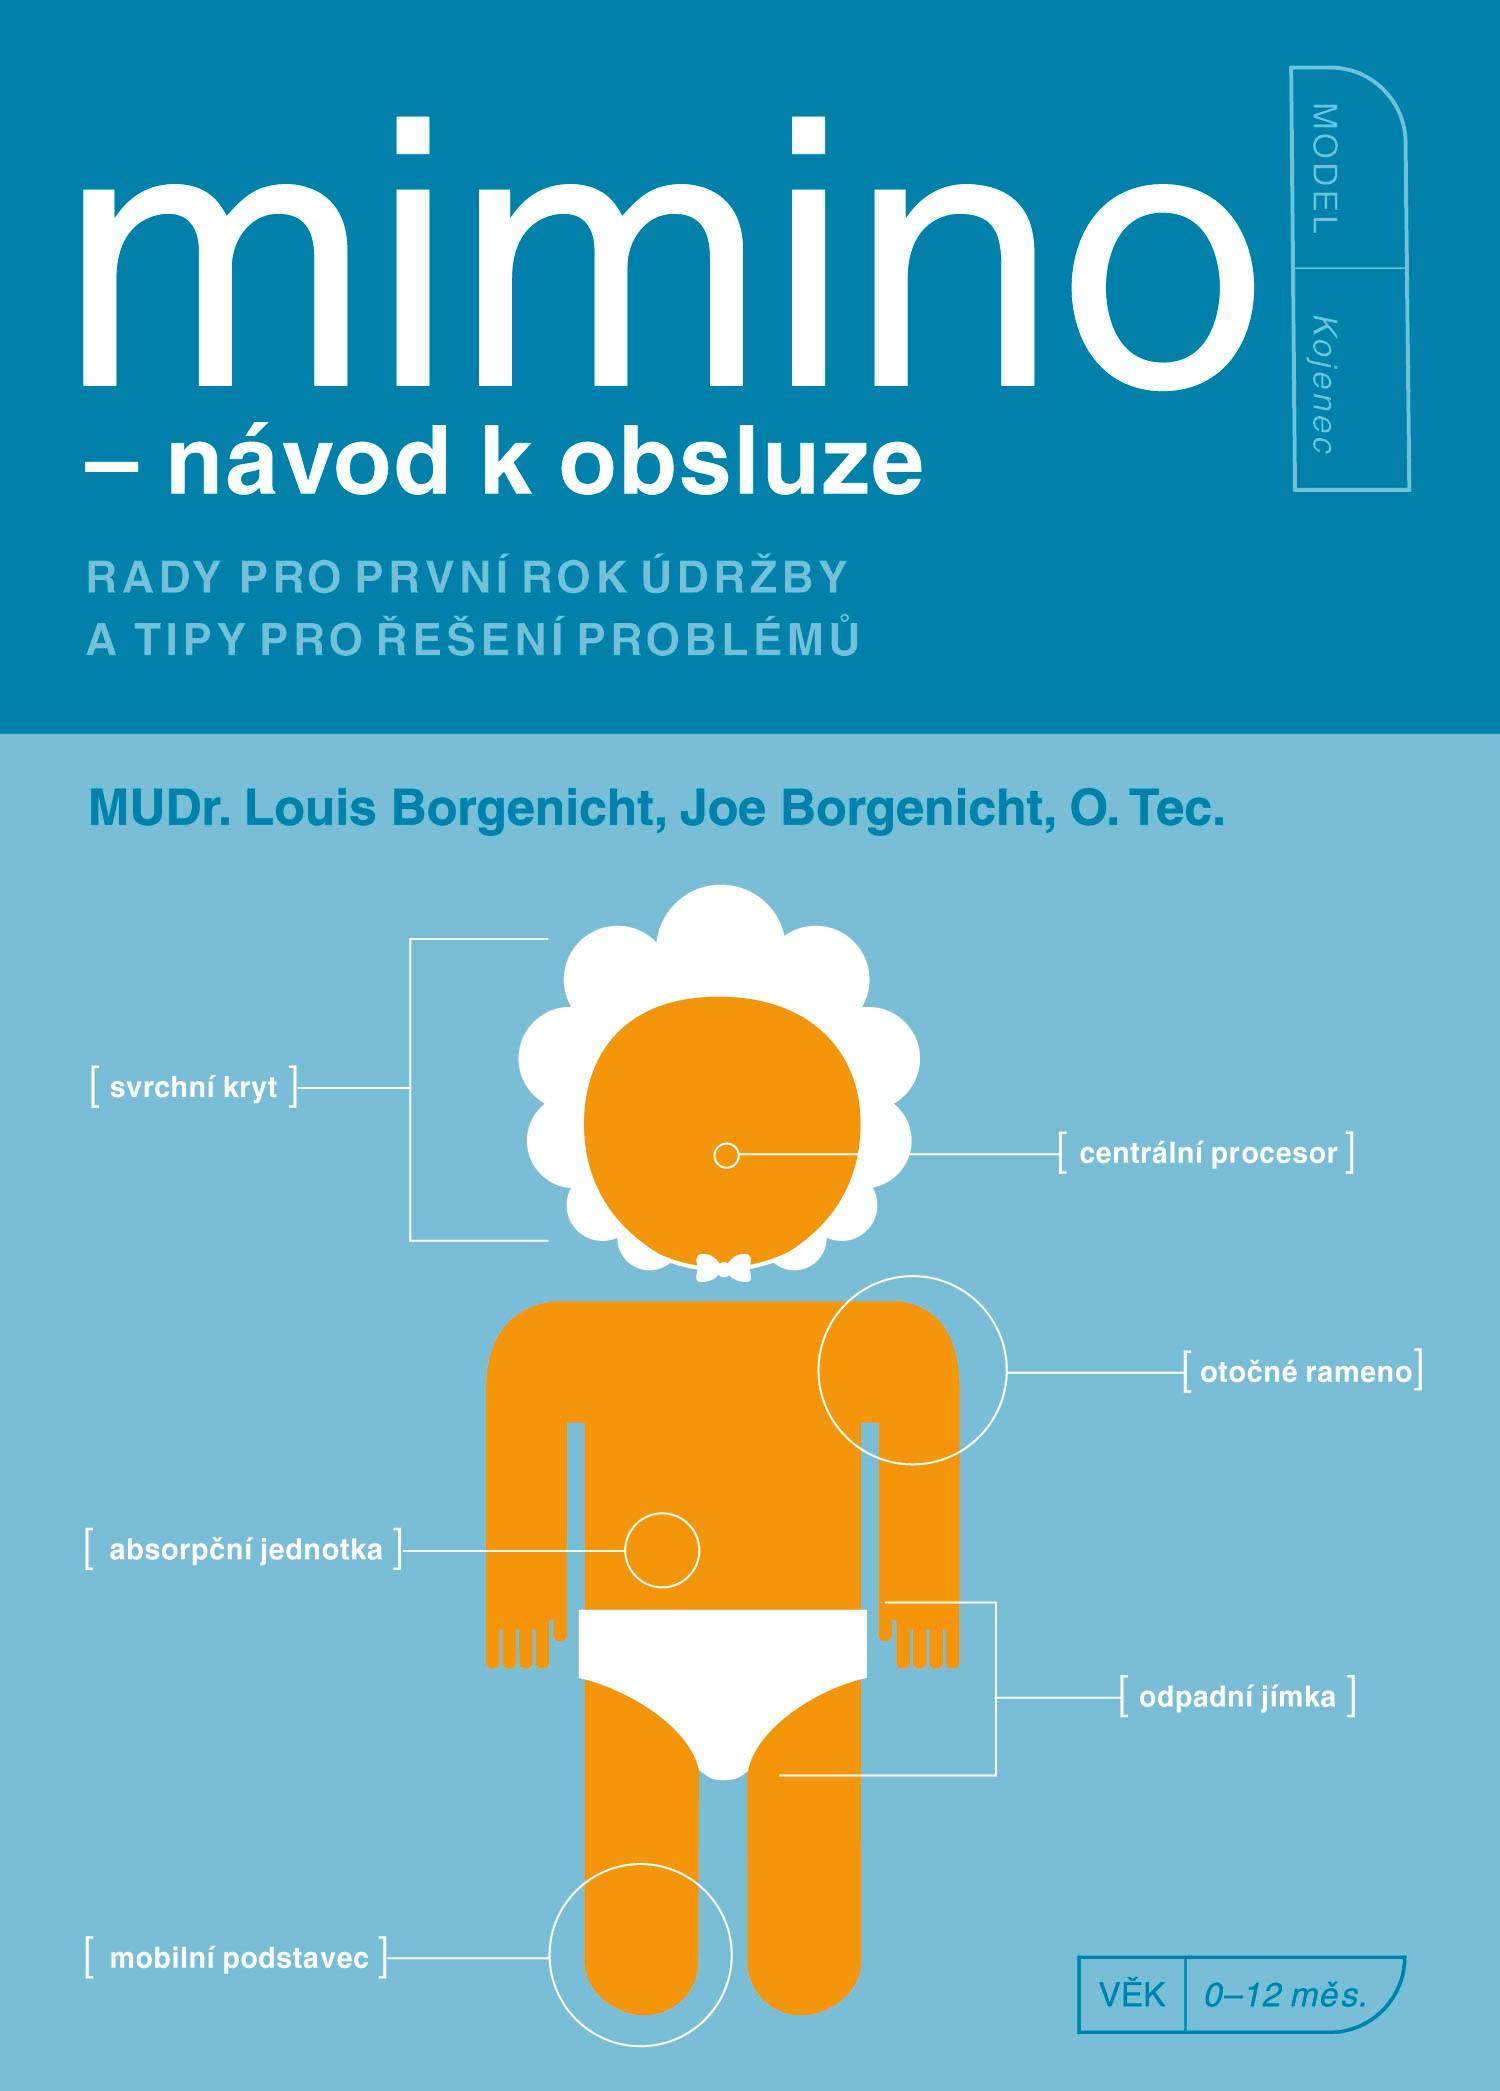 Mimino - návod k obsluze | Louis Borgenicht, Joe Borgenicht